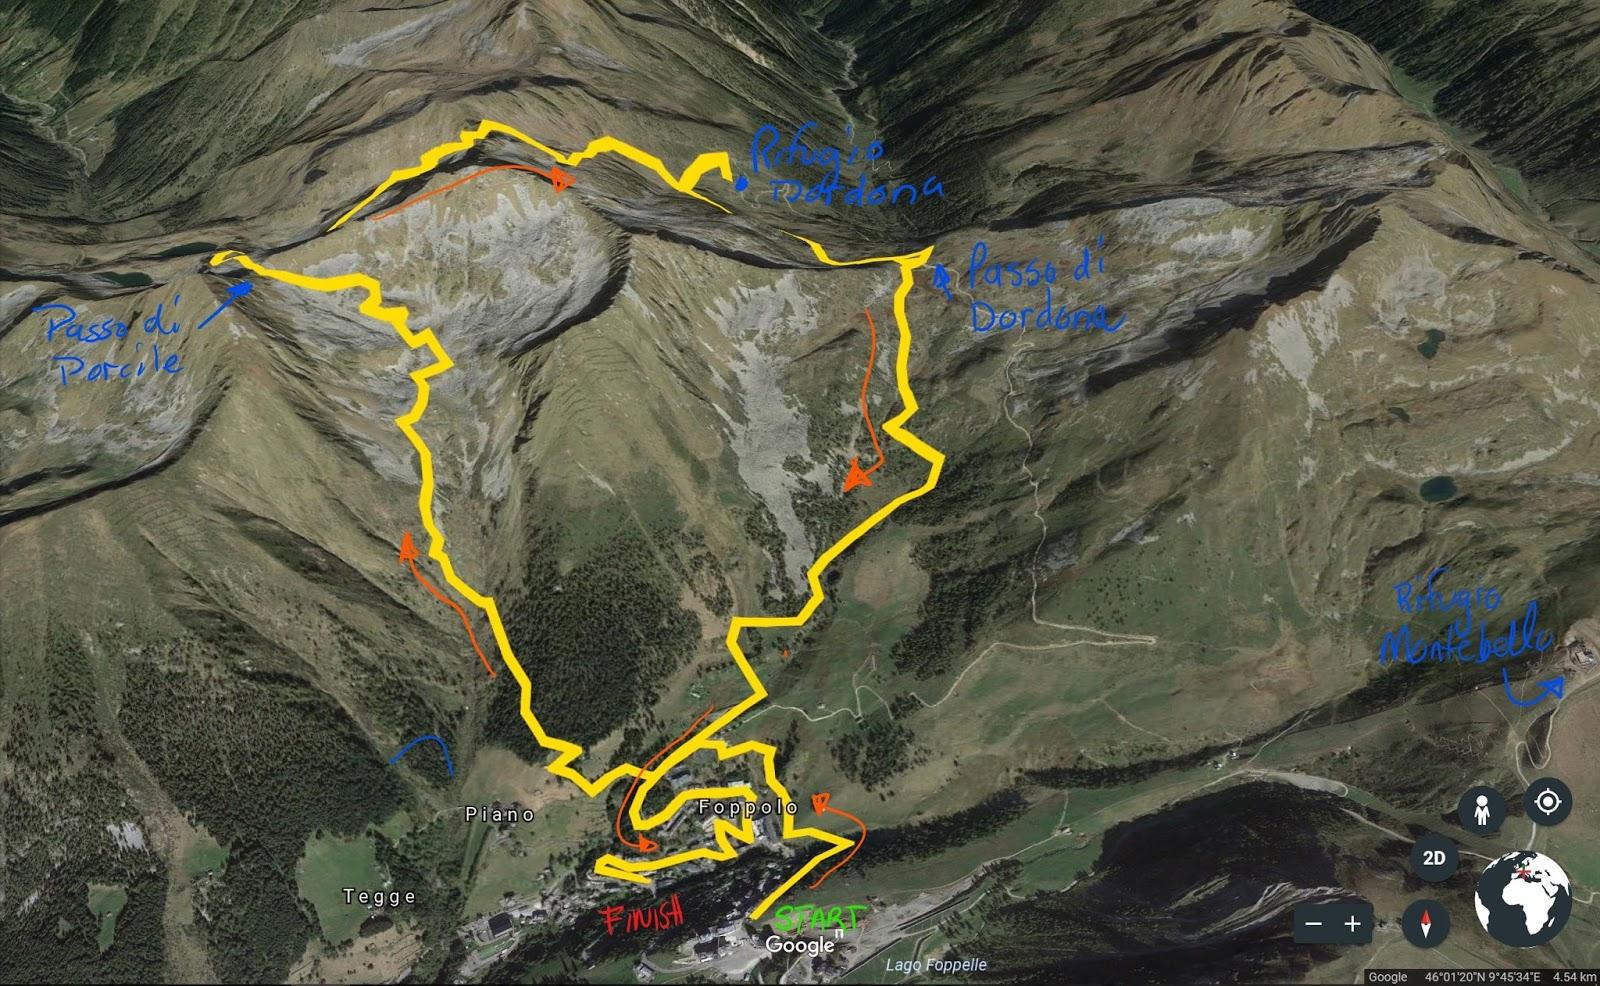 Hike: Passo Porcile and Rifugio Dordona from Foppolo